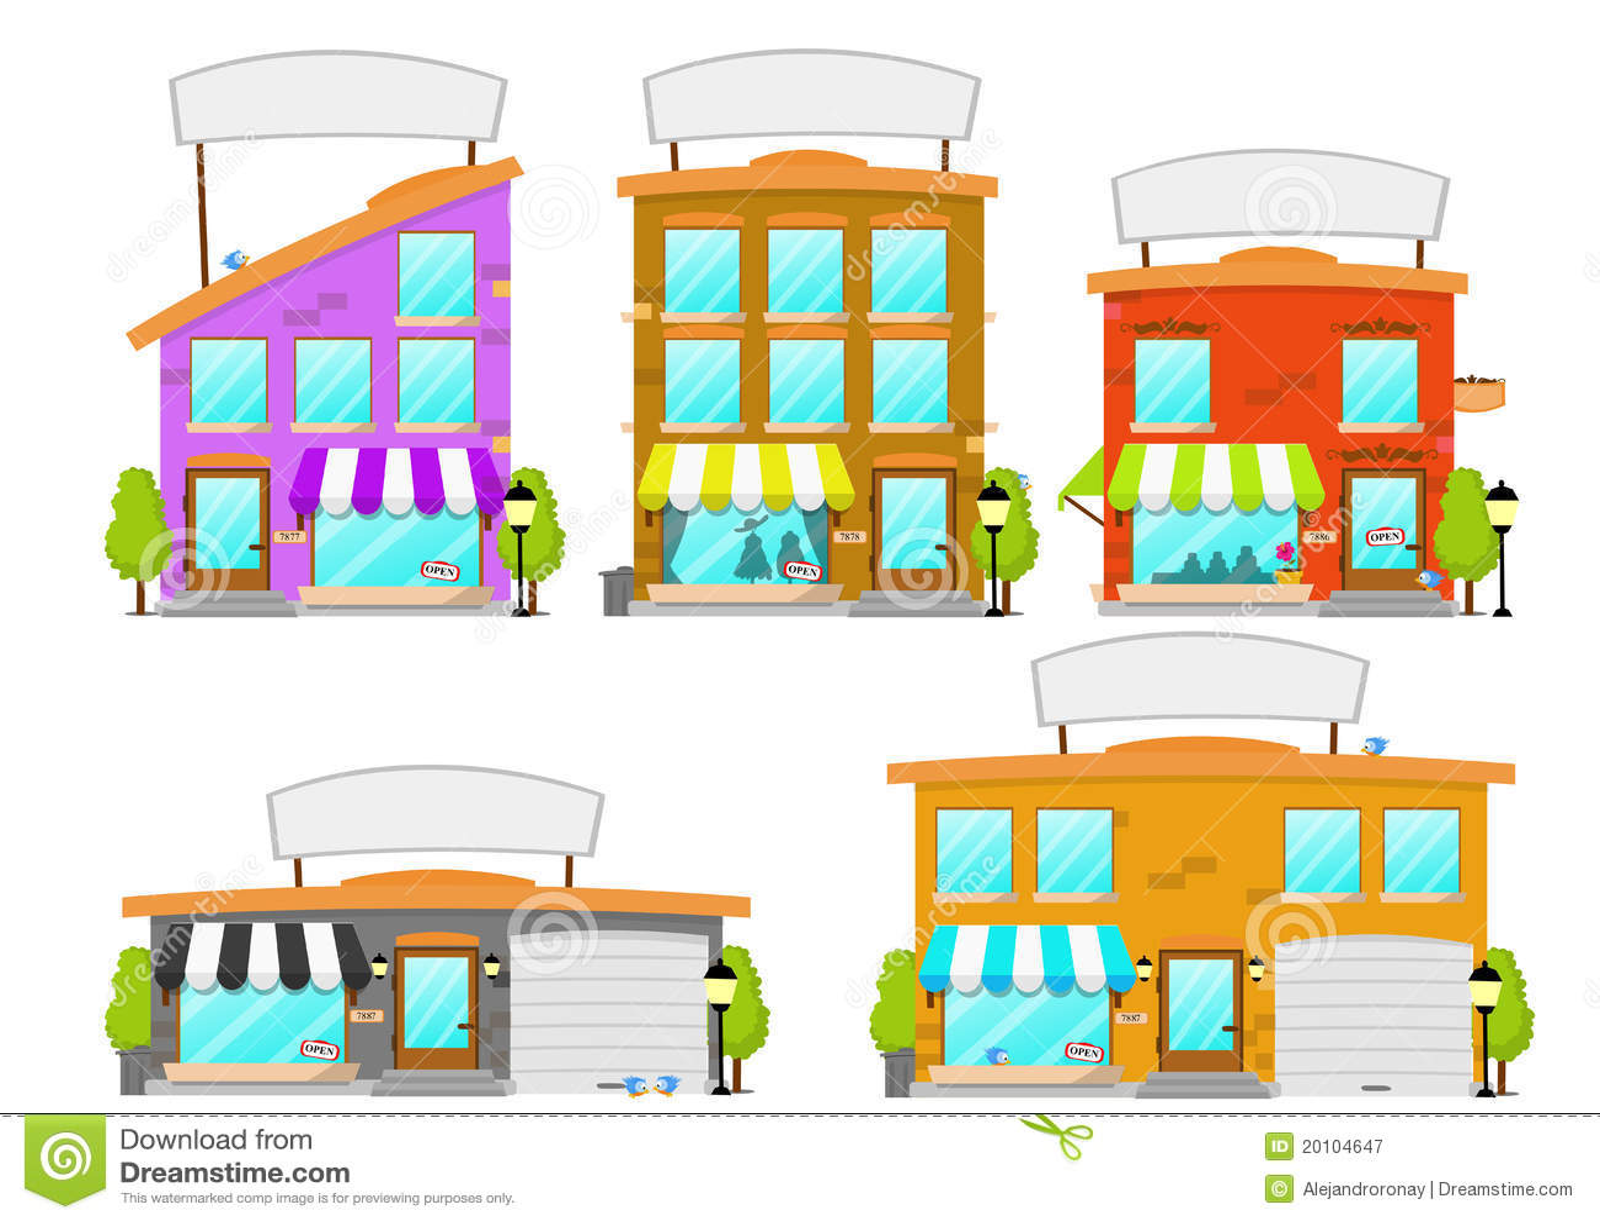 Building cartoon clipart restaurant building and restaurant building - Royalty Free Stock Photo Download Cartoon Boutique Building